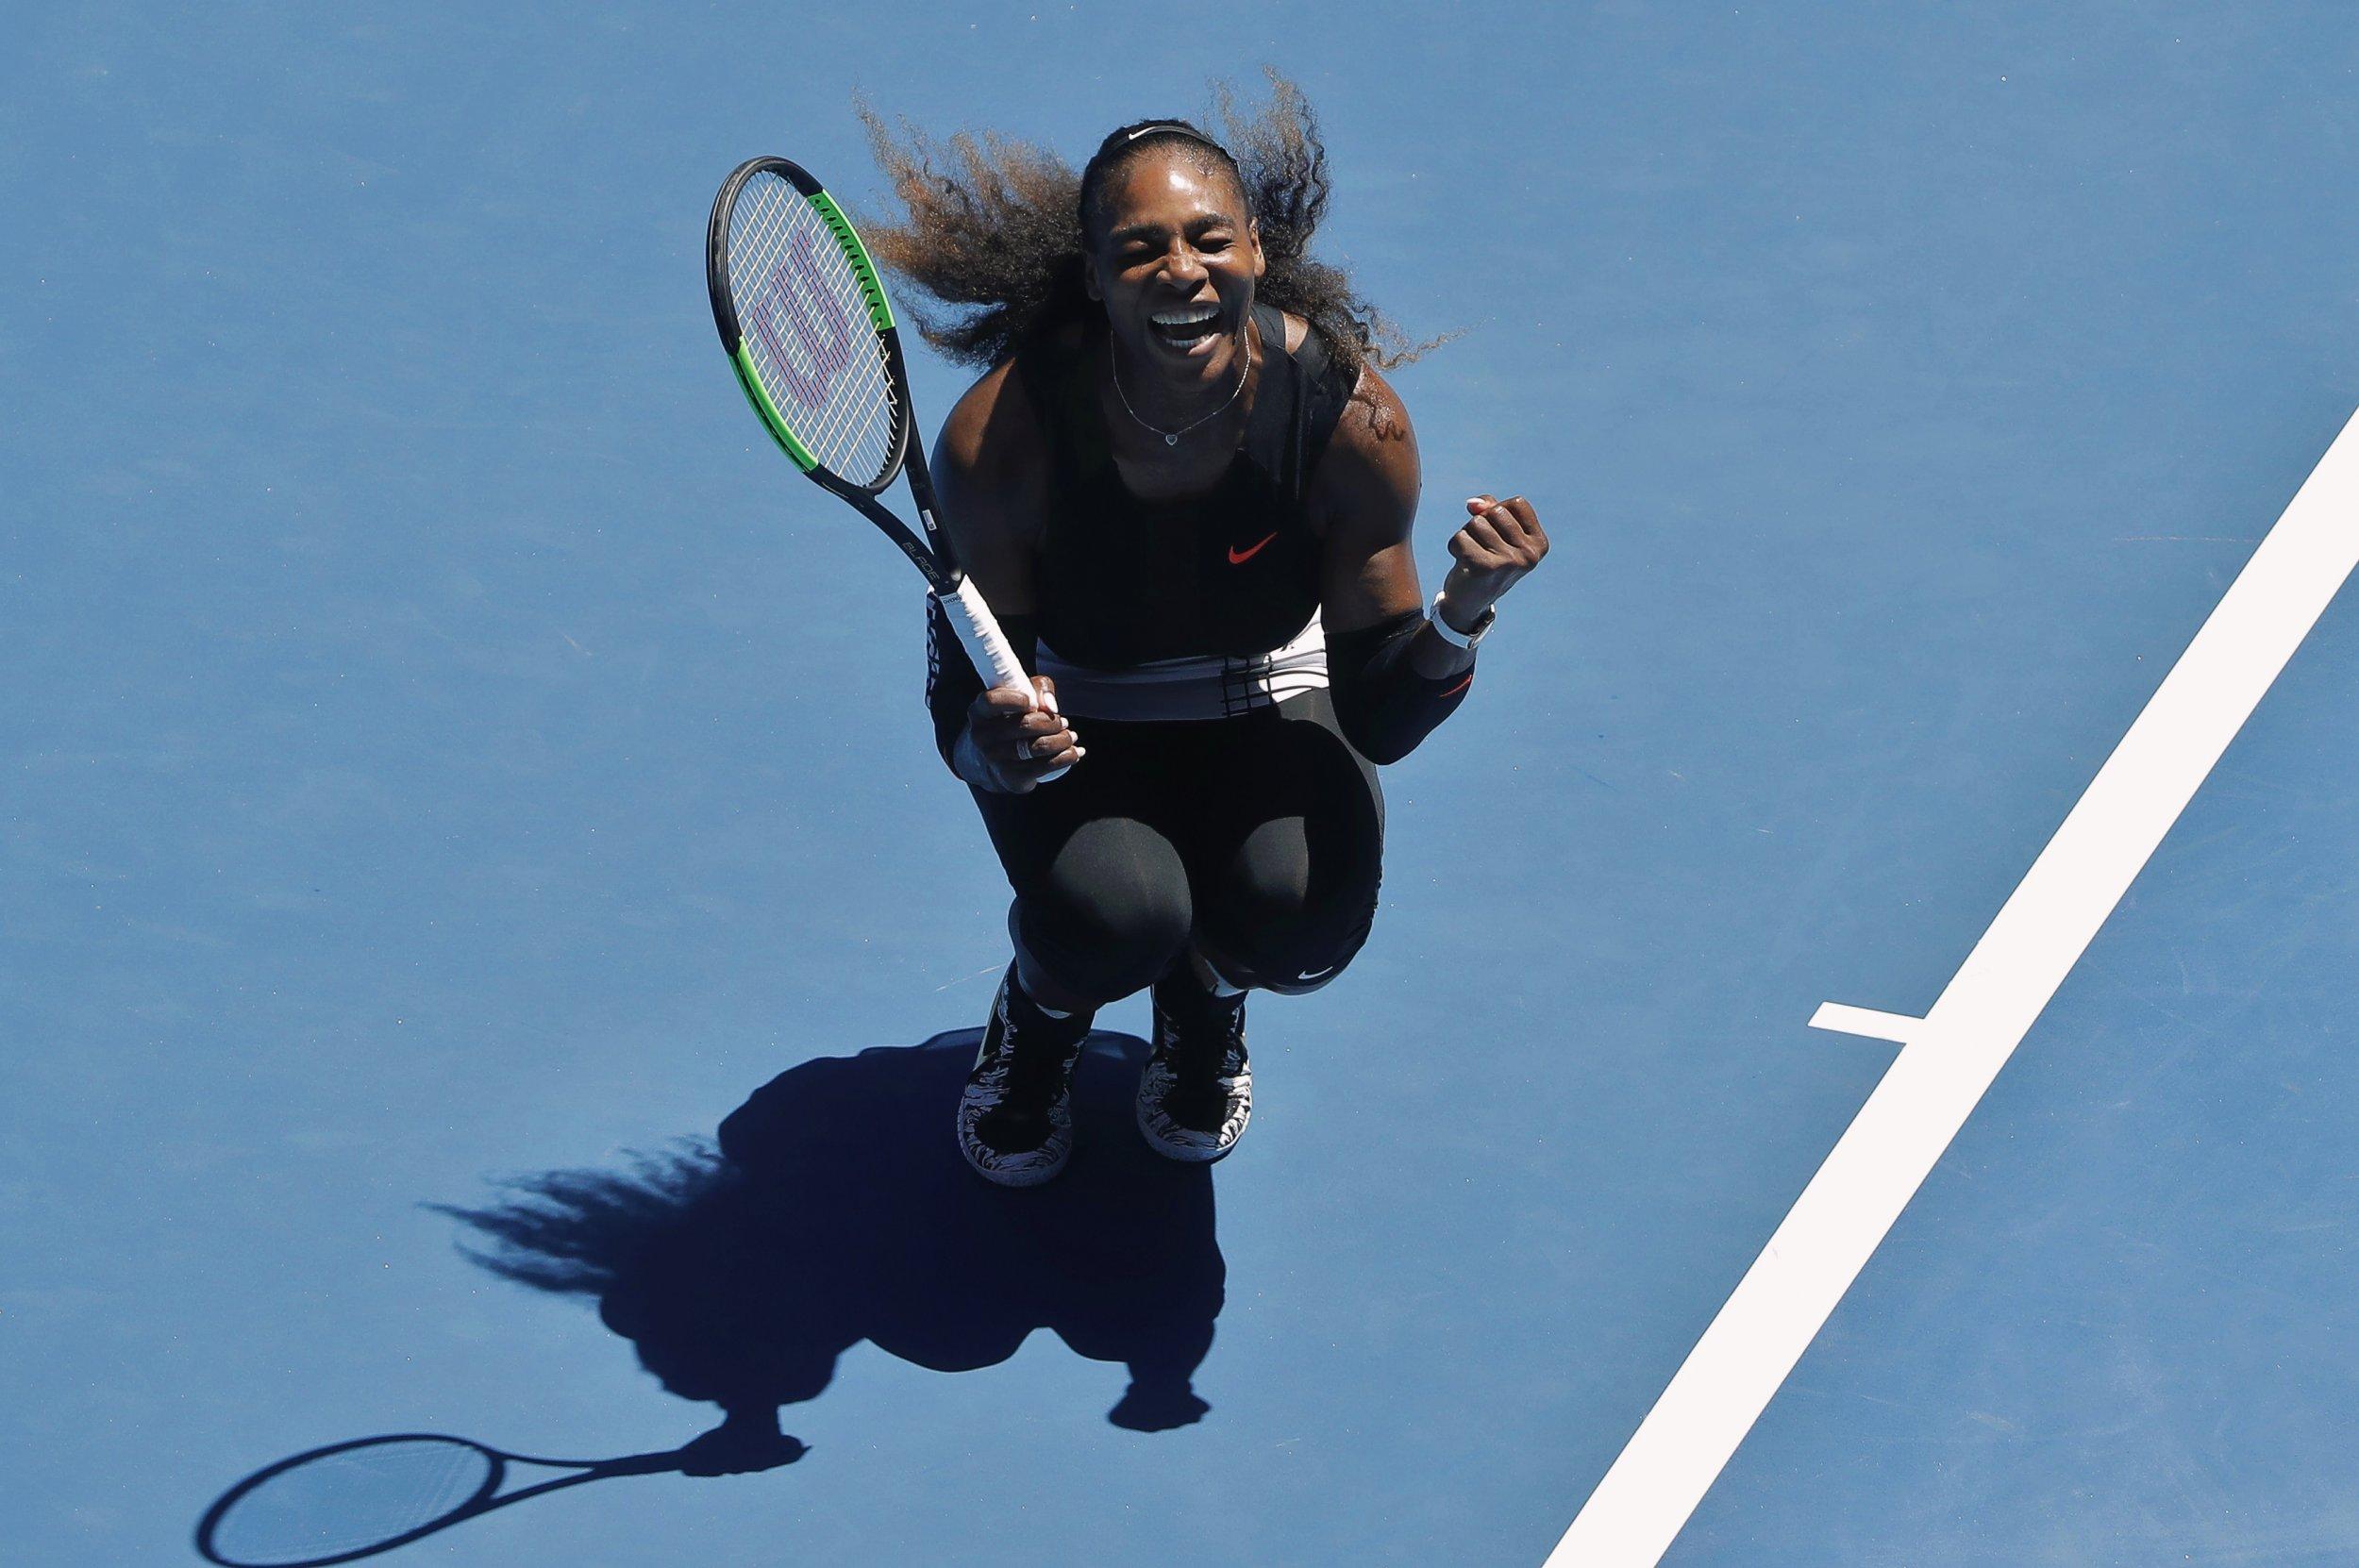 Serena Williams, 23 times a Grand Slam singles winner, is pregnant.